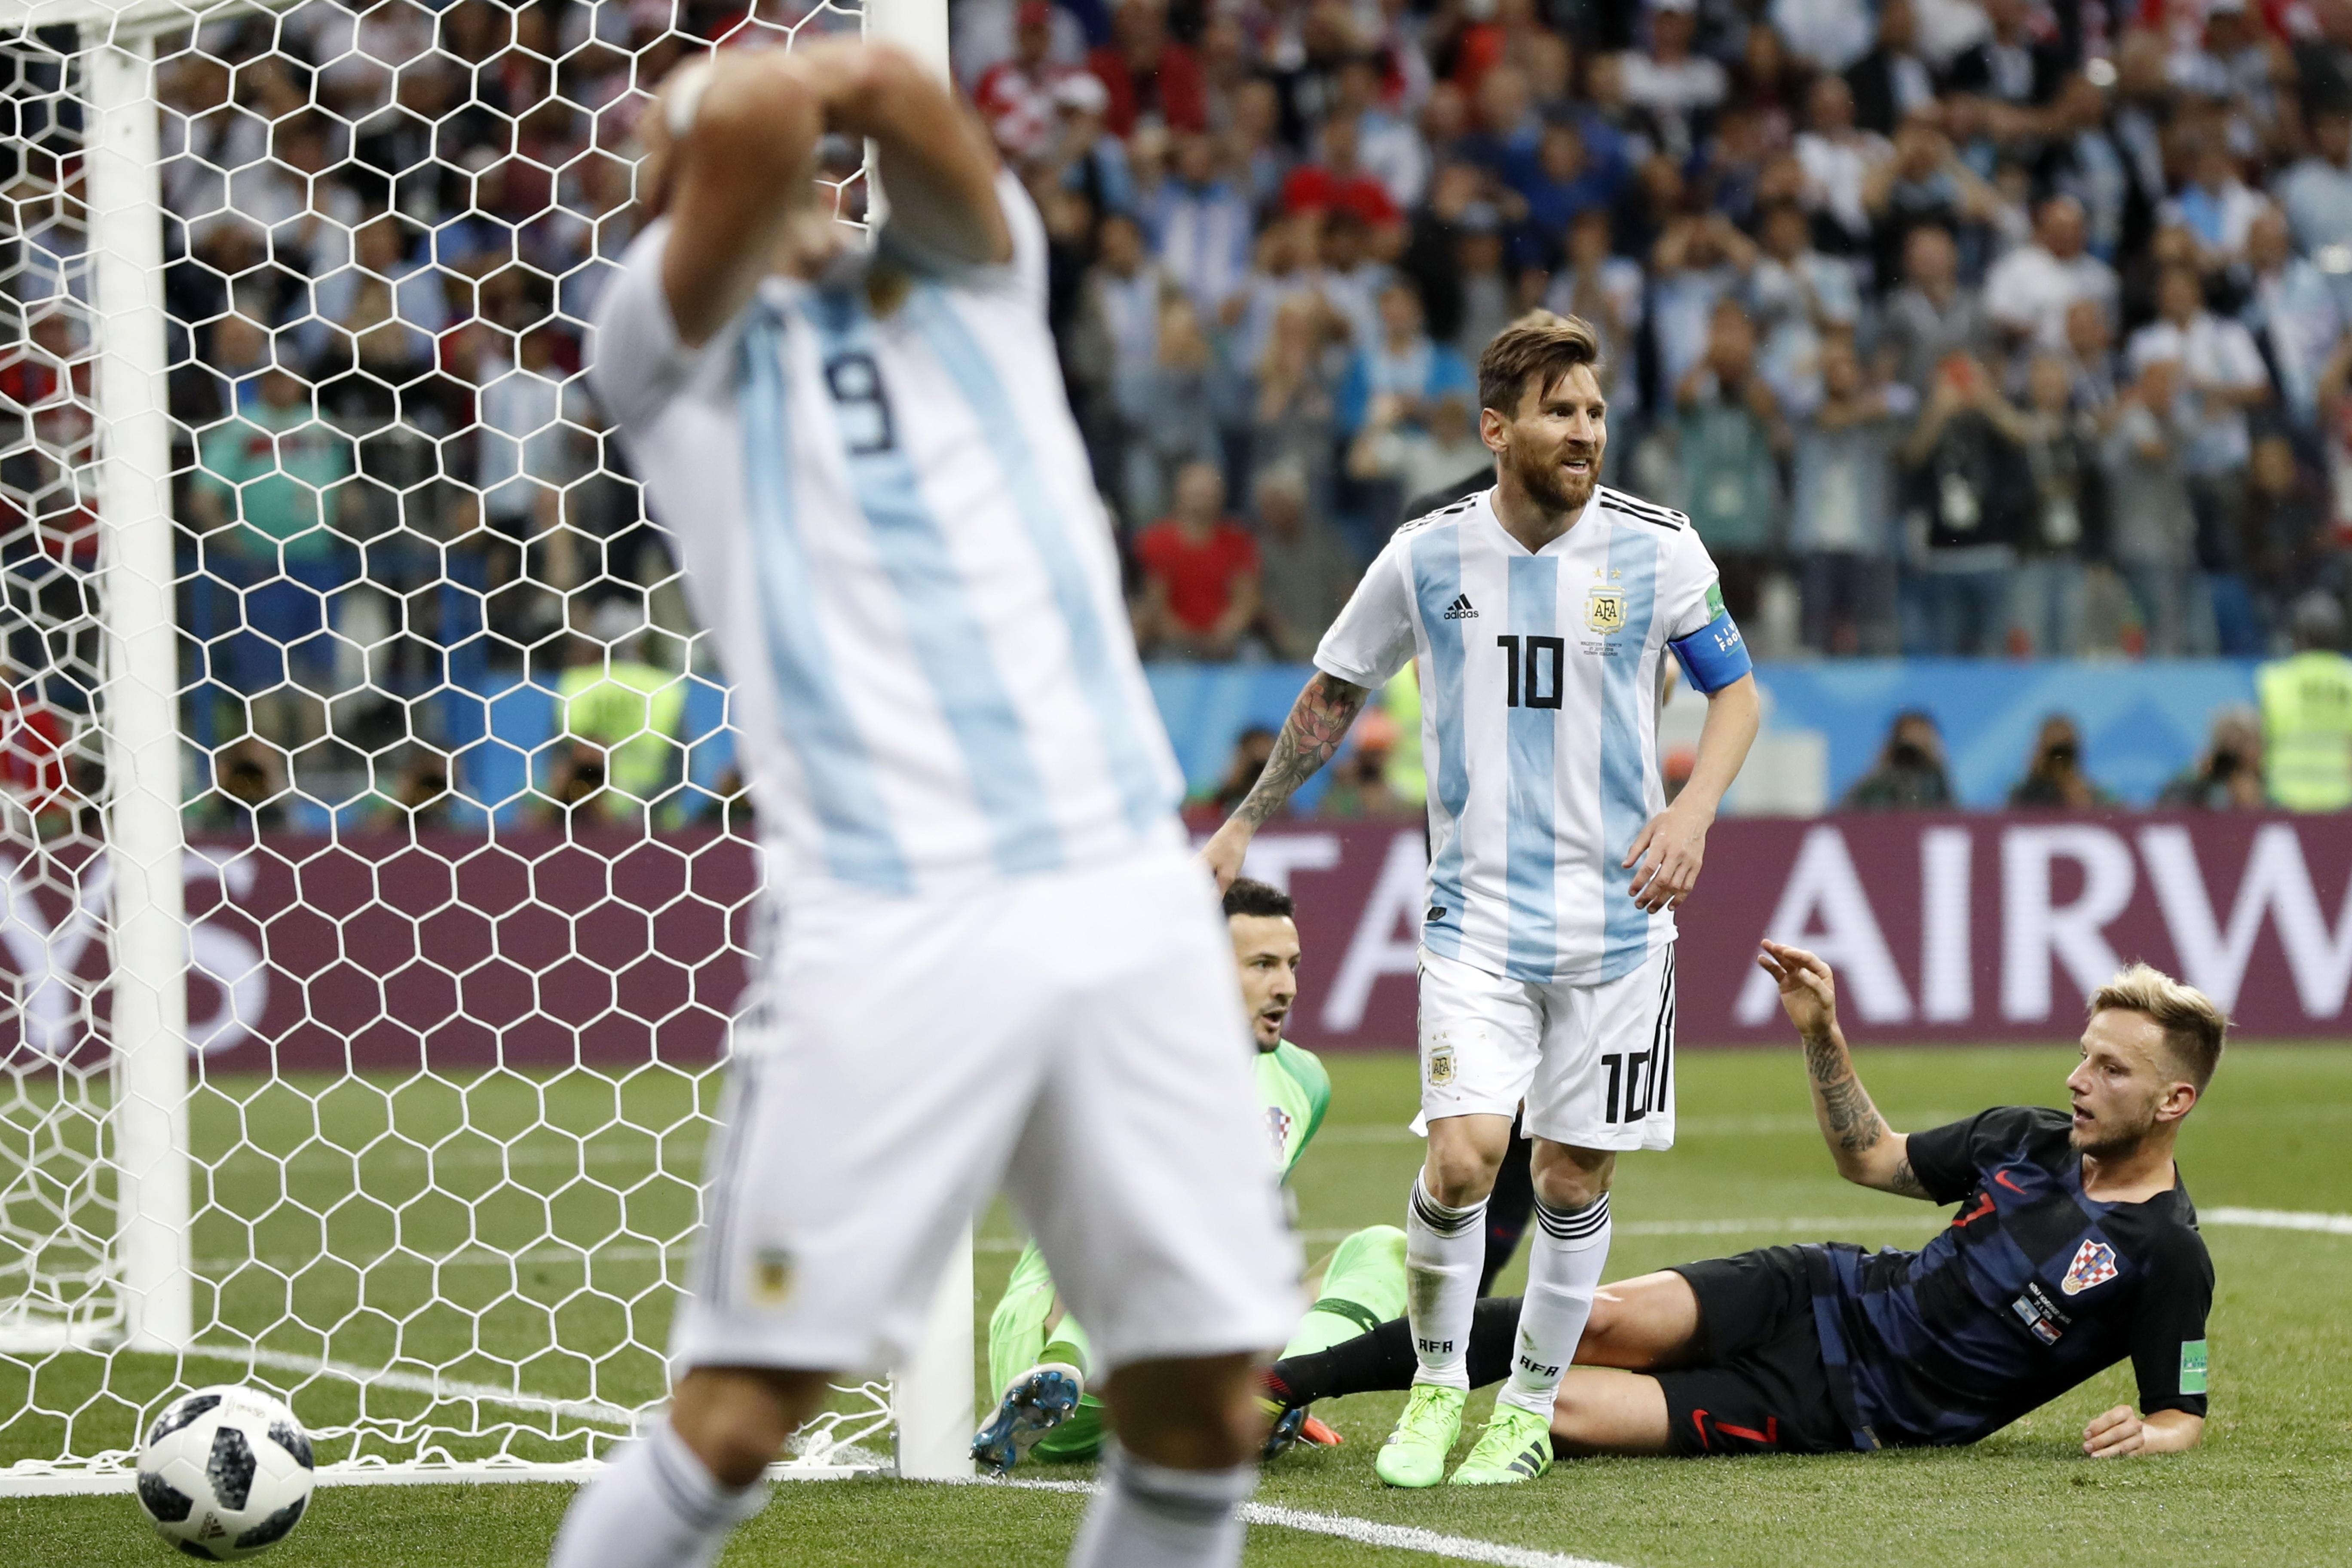 <div class='meta'><div class='origin-logo' data-origin='none'></div><span class='caption-text' data-credit='Petr David Josek/AP Photo'>Argentina's Lionel Messi, center, reacts after missing to score during the group D match between Argentina and Croatia in Nizhny Novgorod Stadium on June 21.</span></div>